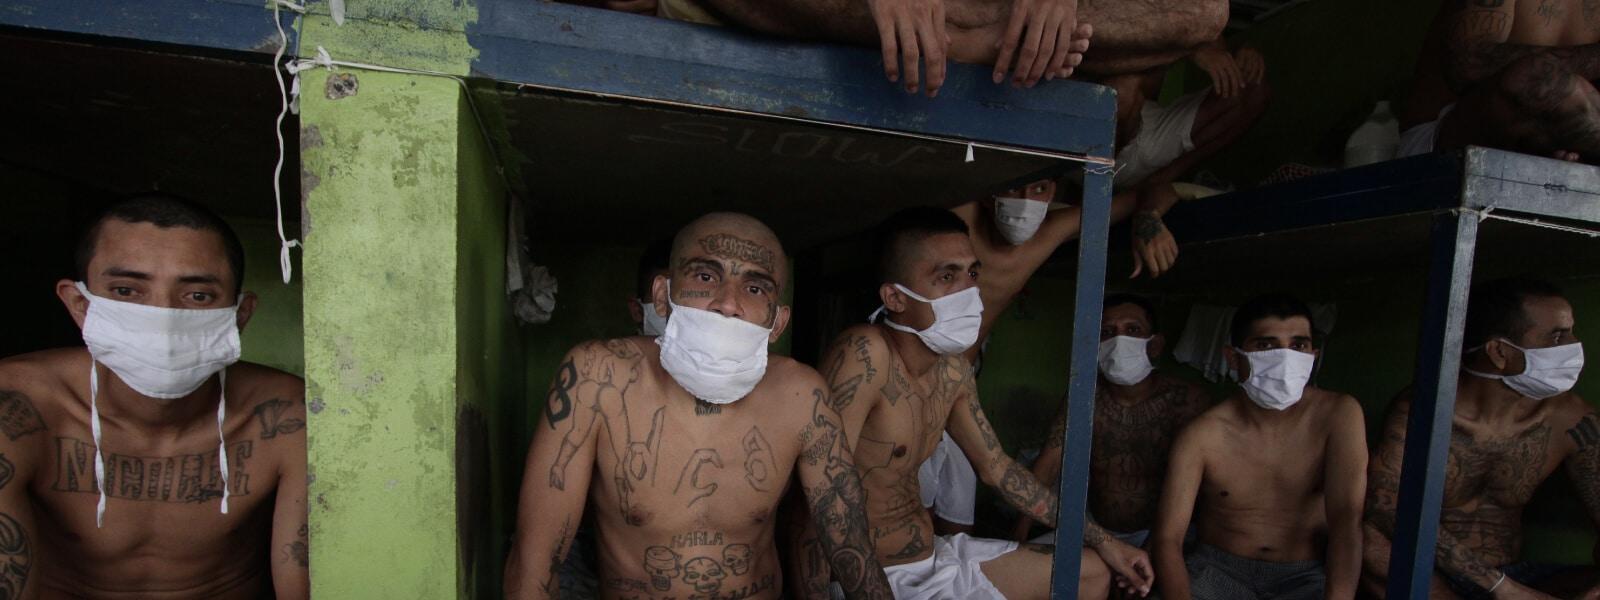 1.-El-Salvador_Imprisoned-gang-members-wearing-protective-face-masks-sit-inside-a-group-cell_AP_20335158061131_2020_Gamechangers.jpg